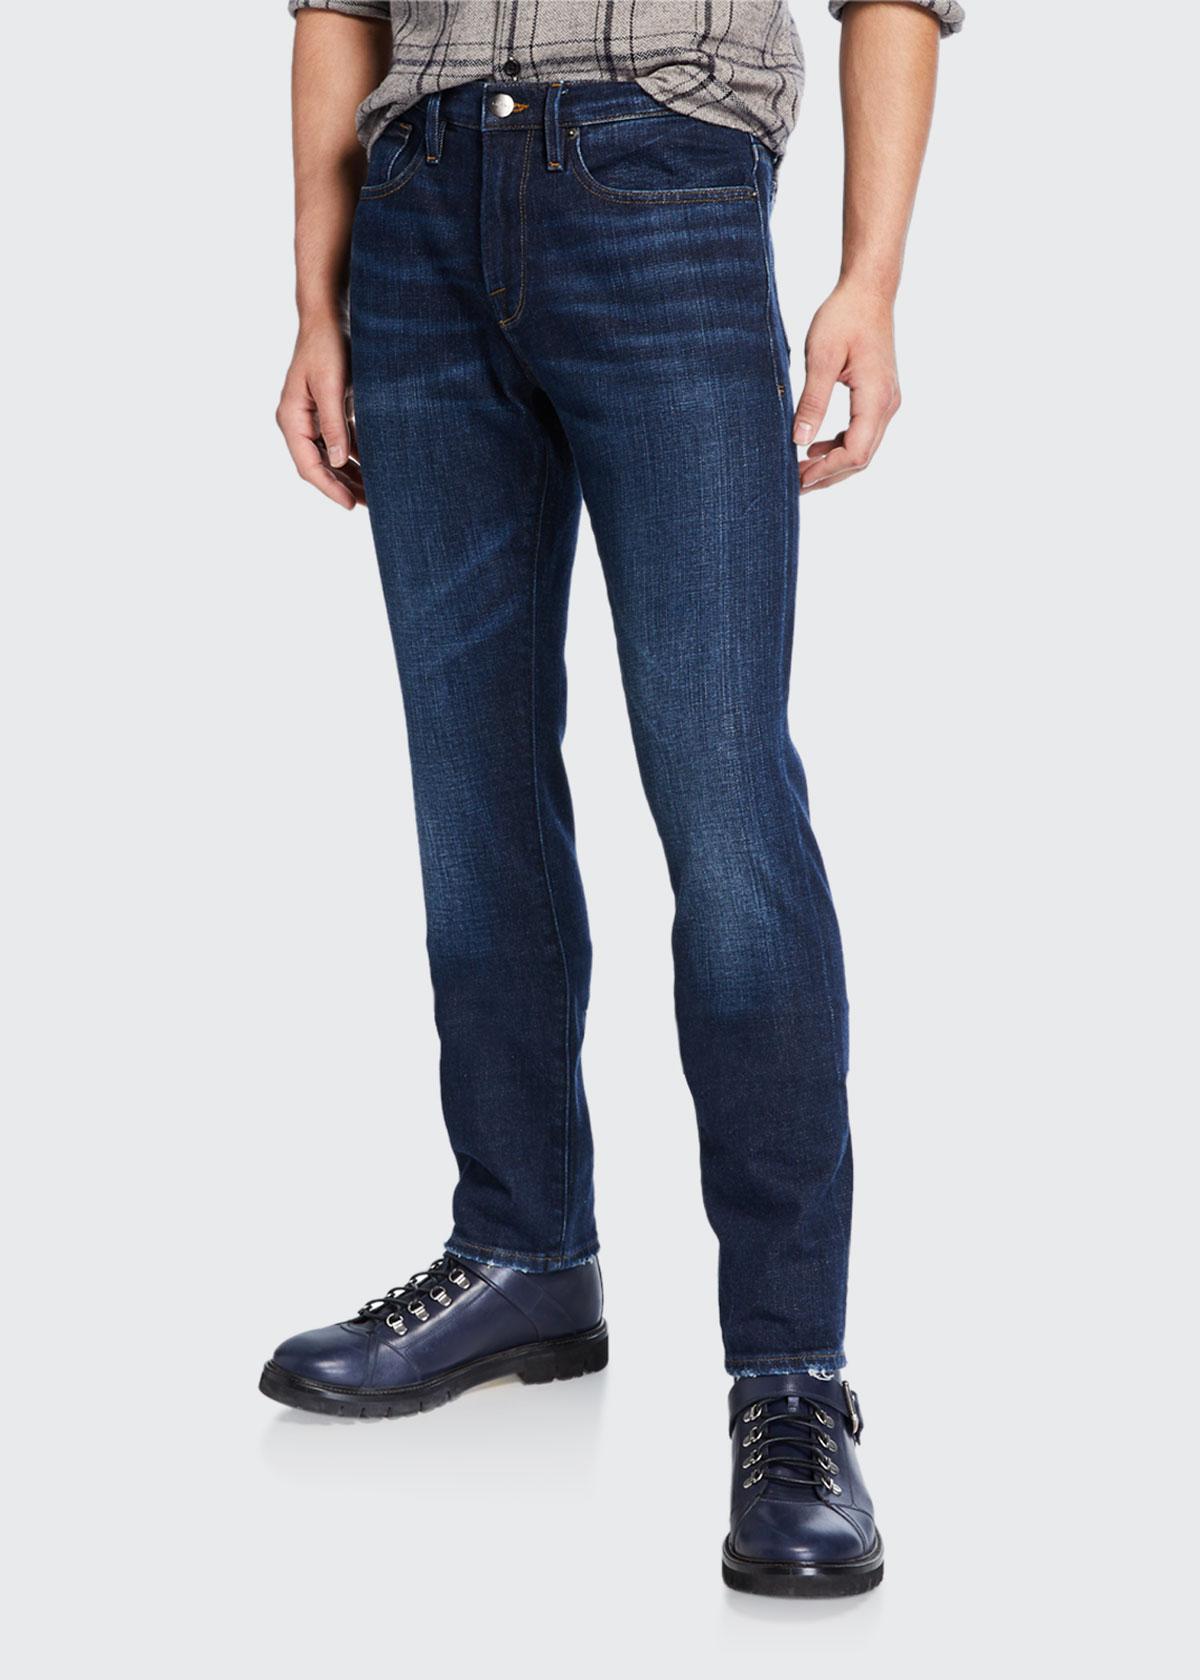 Frame Jeans MEN'S L'HOMME SLIM PULLMAN RIPPED-KNEE JEANS